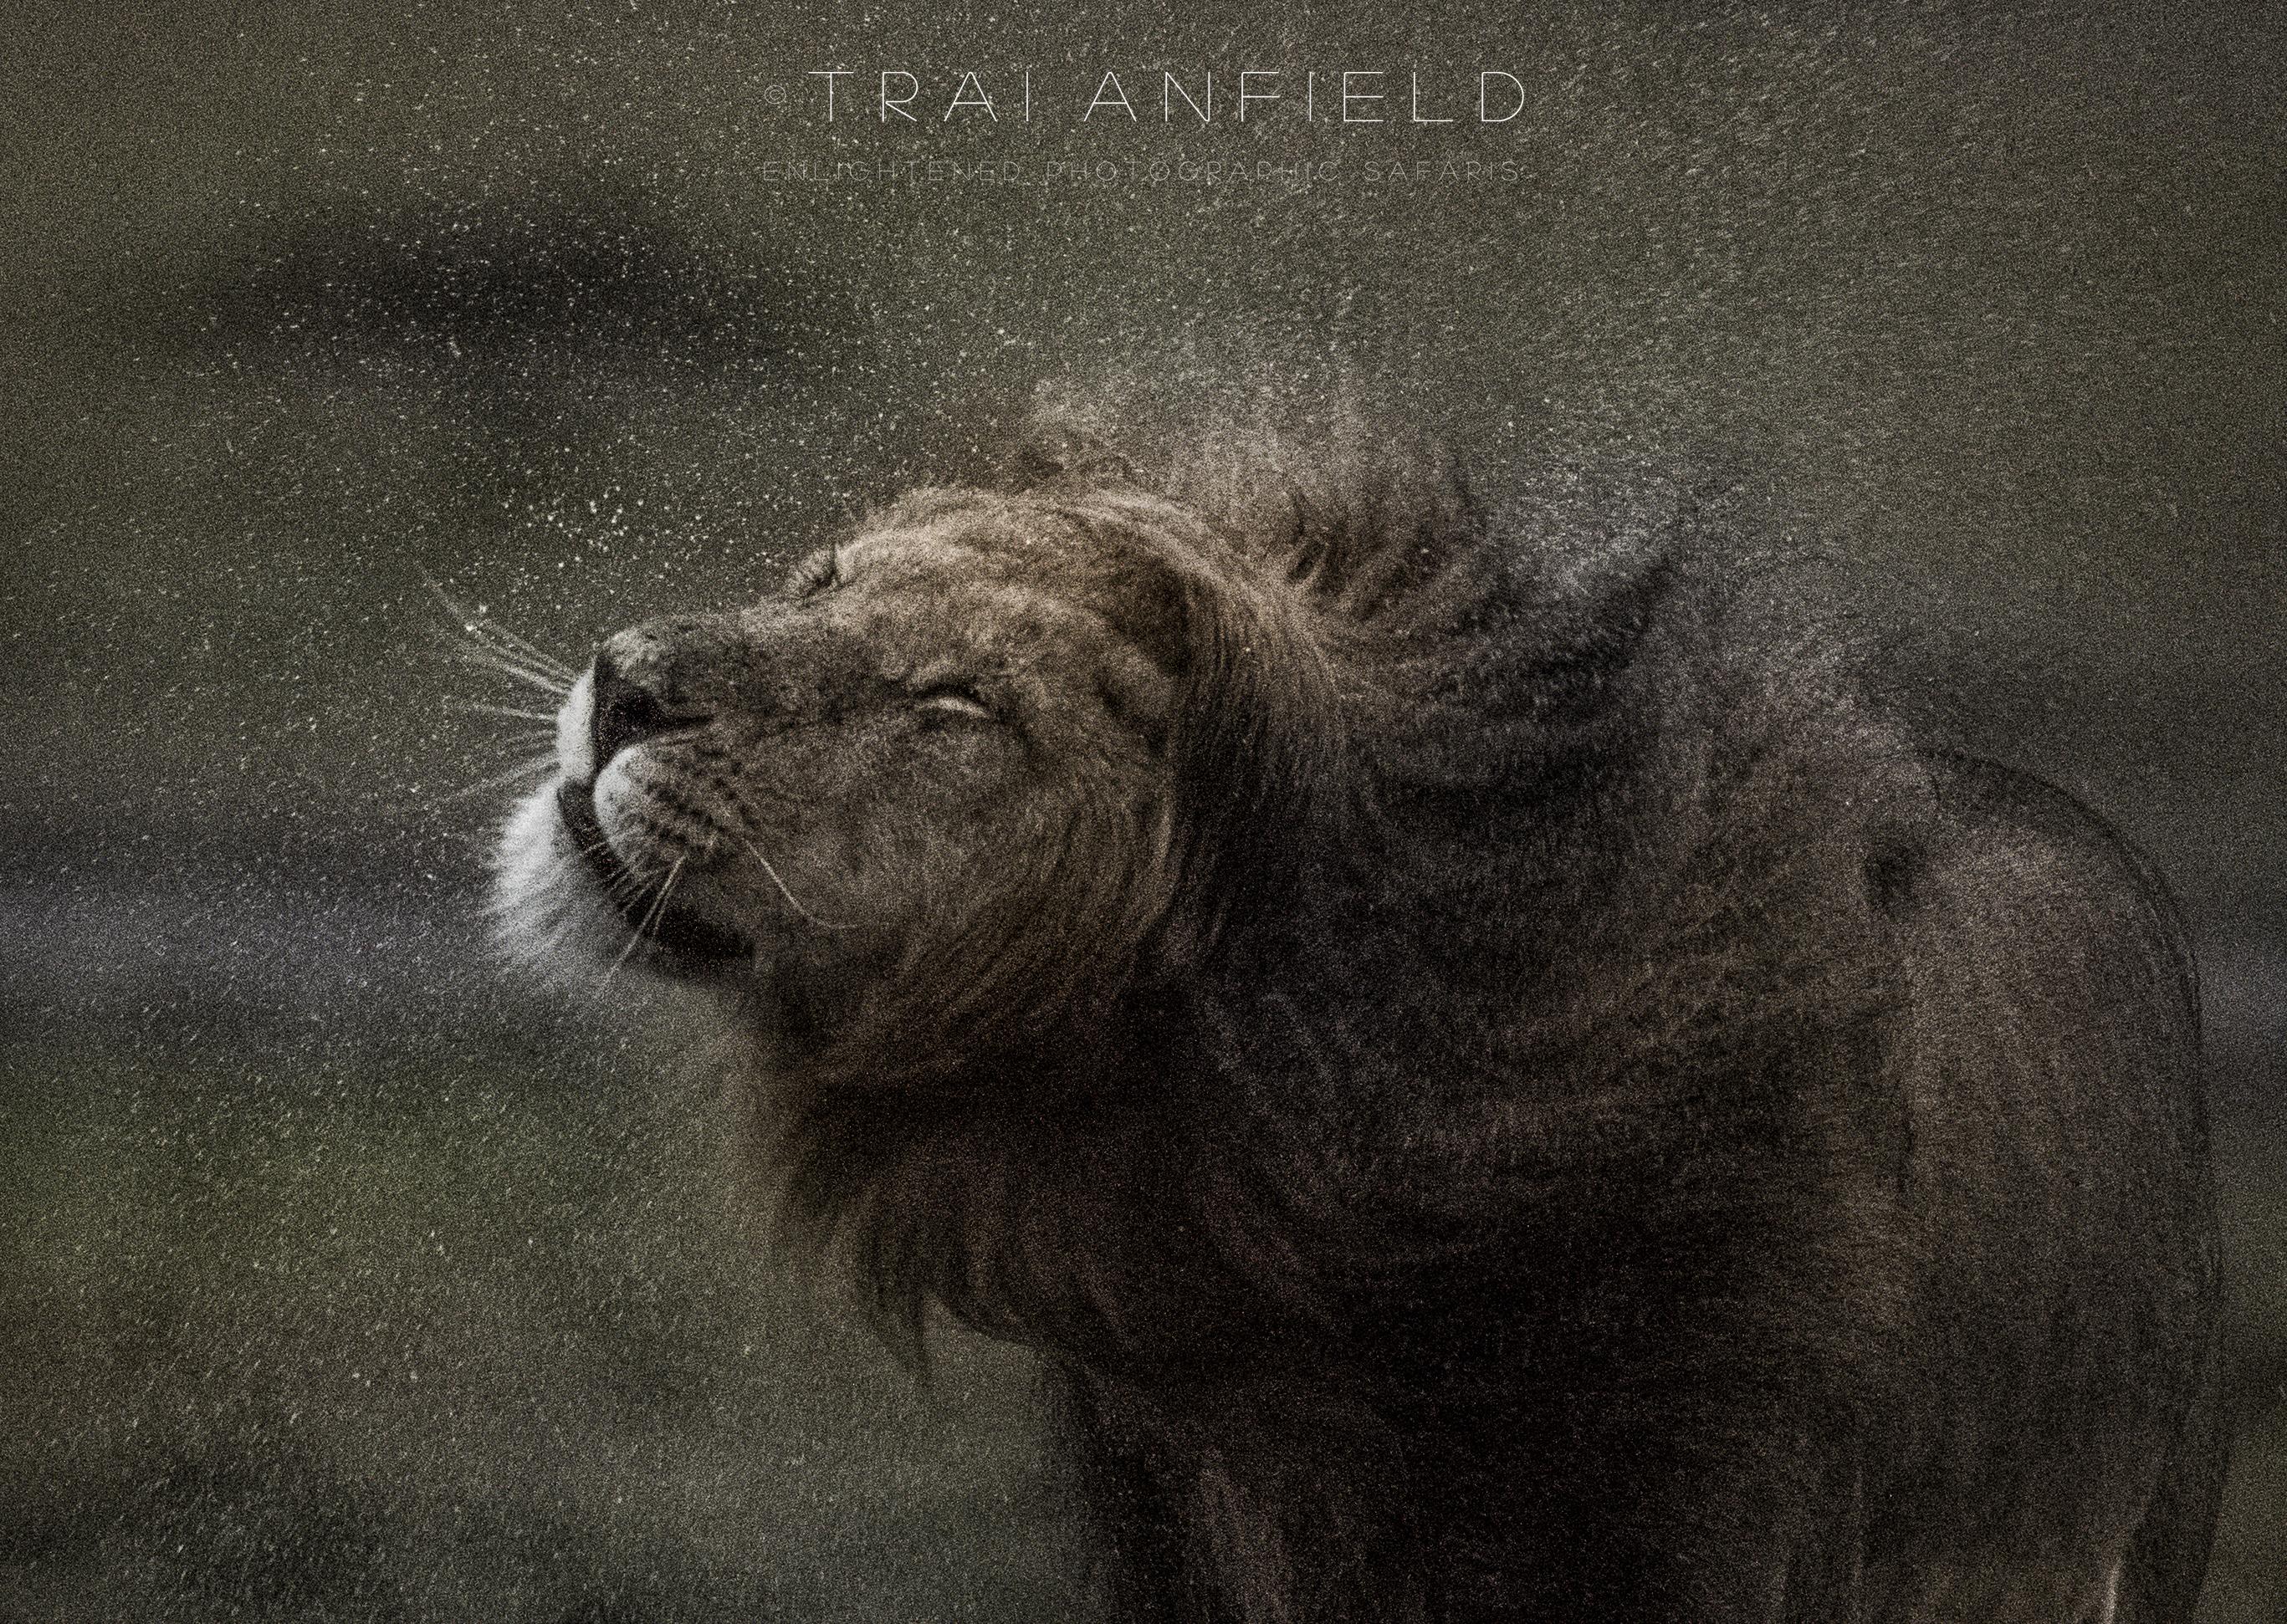 Trai Anfield Enlightened Photographic Safaris Kenya Serian lion rain-0068_WEB.jpg